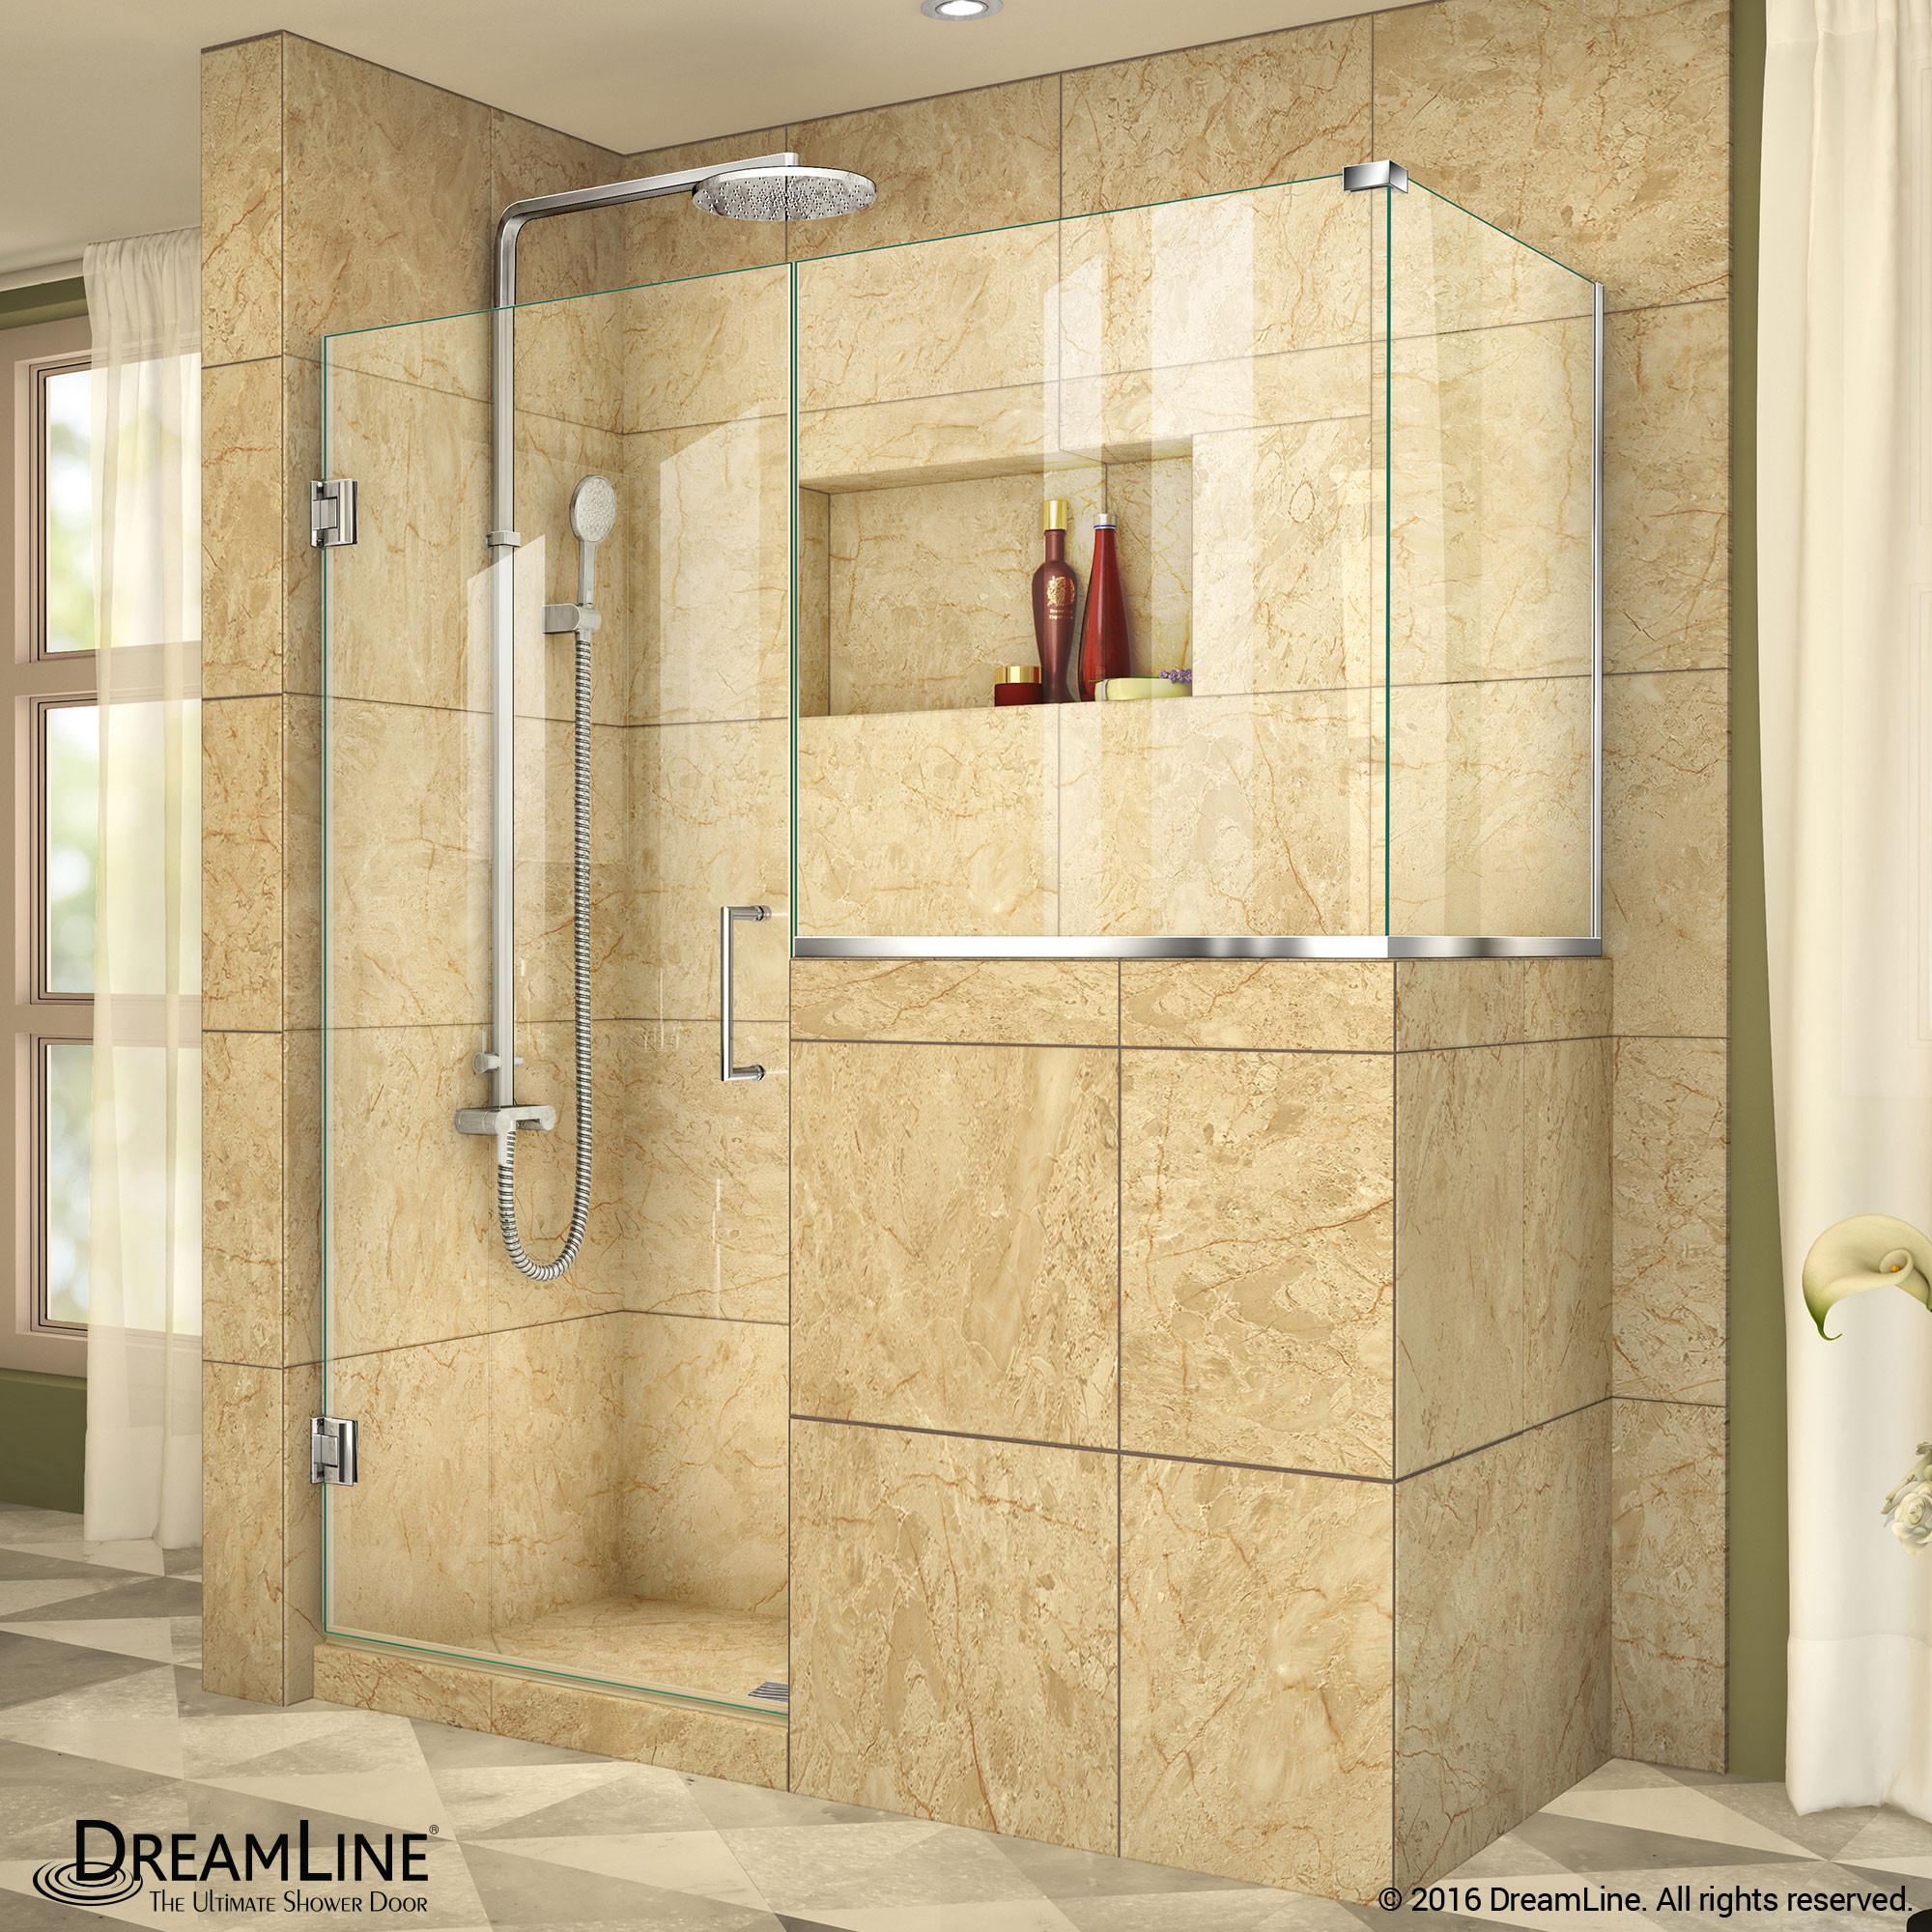 "DreamLine SHEN-2424303430-01 Unidoor Plus 54 x 30.375 x 72"" Hinged Shower Enclosure In Chrome Finish"